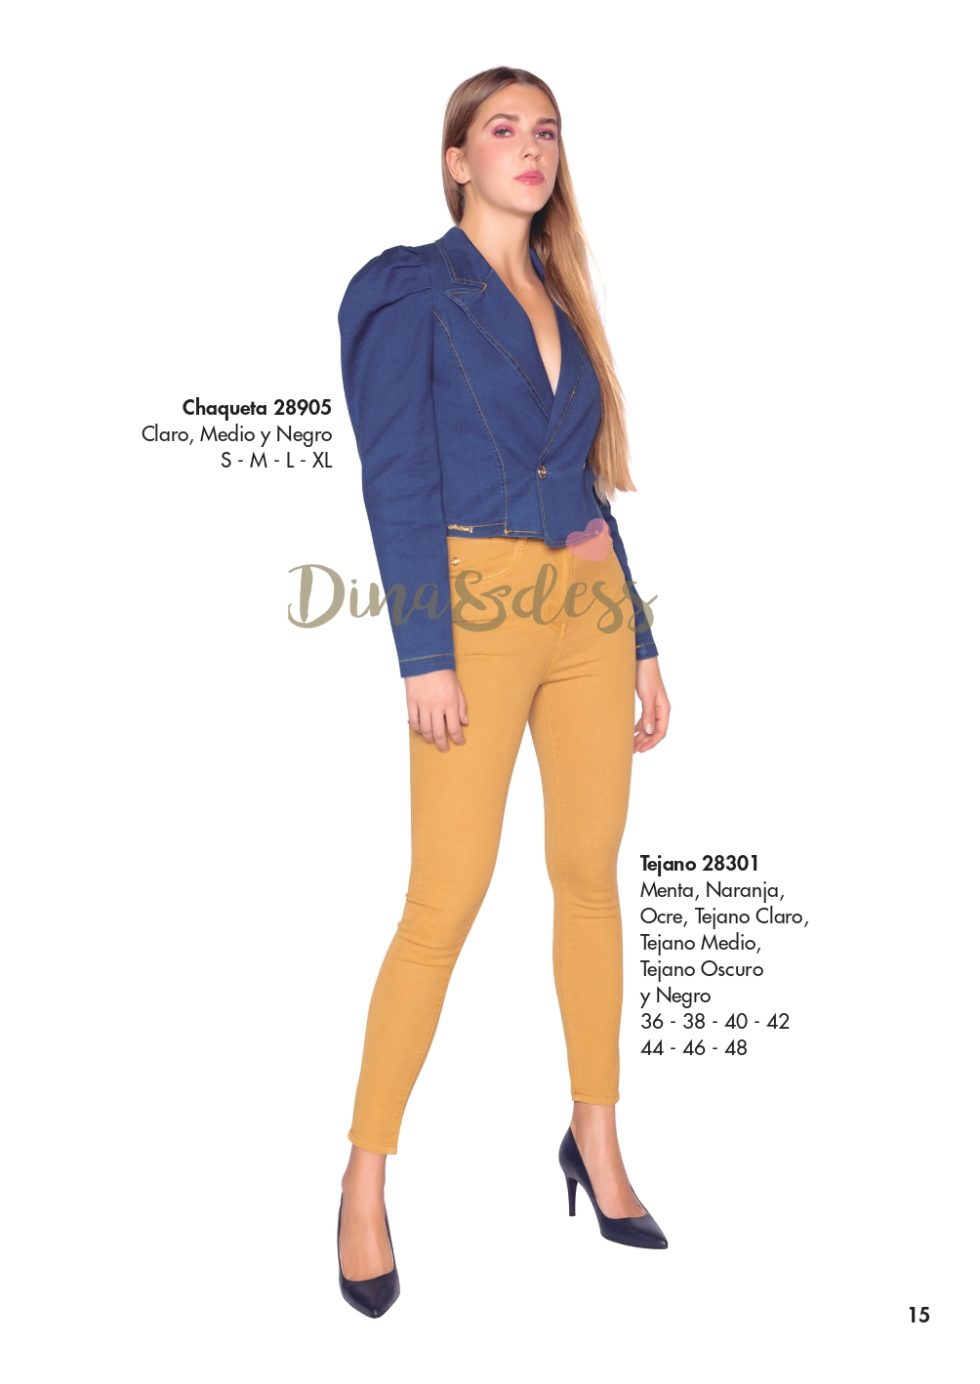 Verano 2021 Dina&Dess Clientes_page-0017